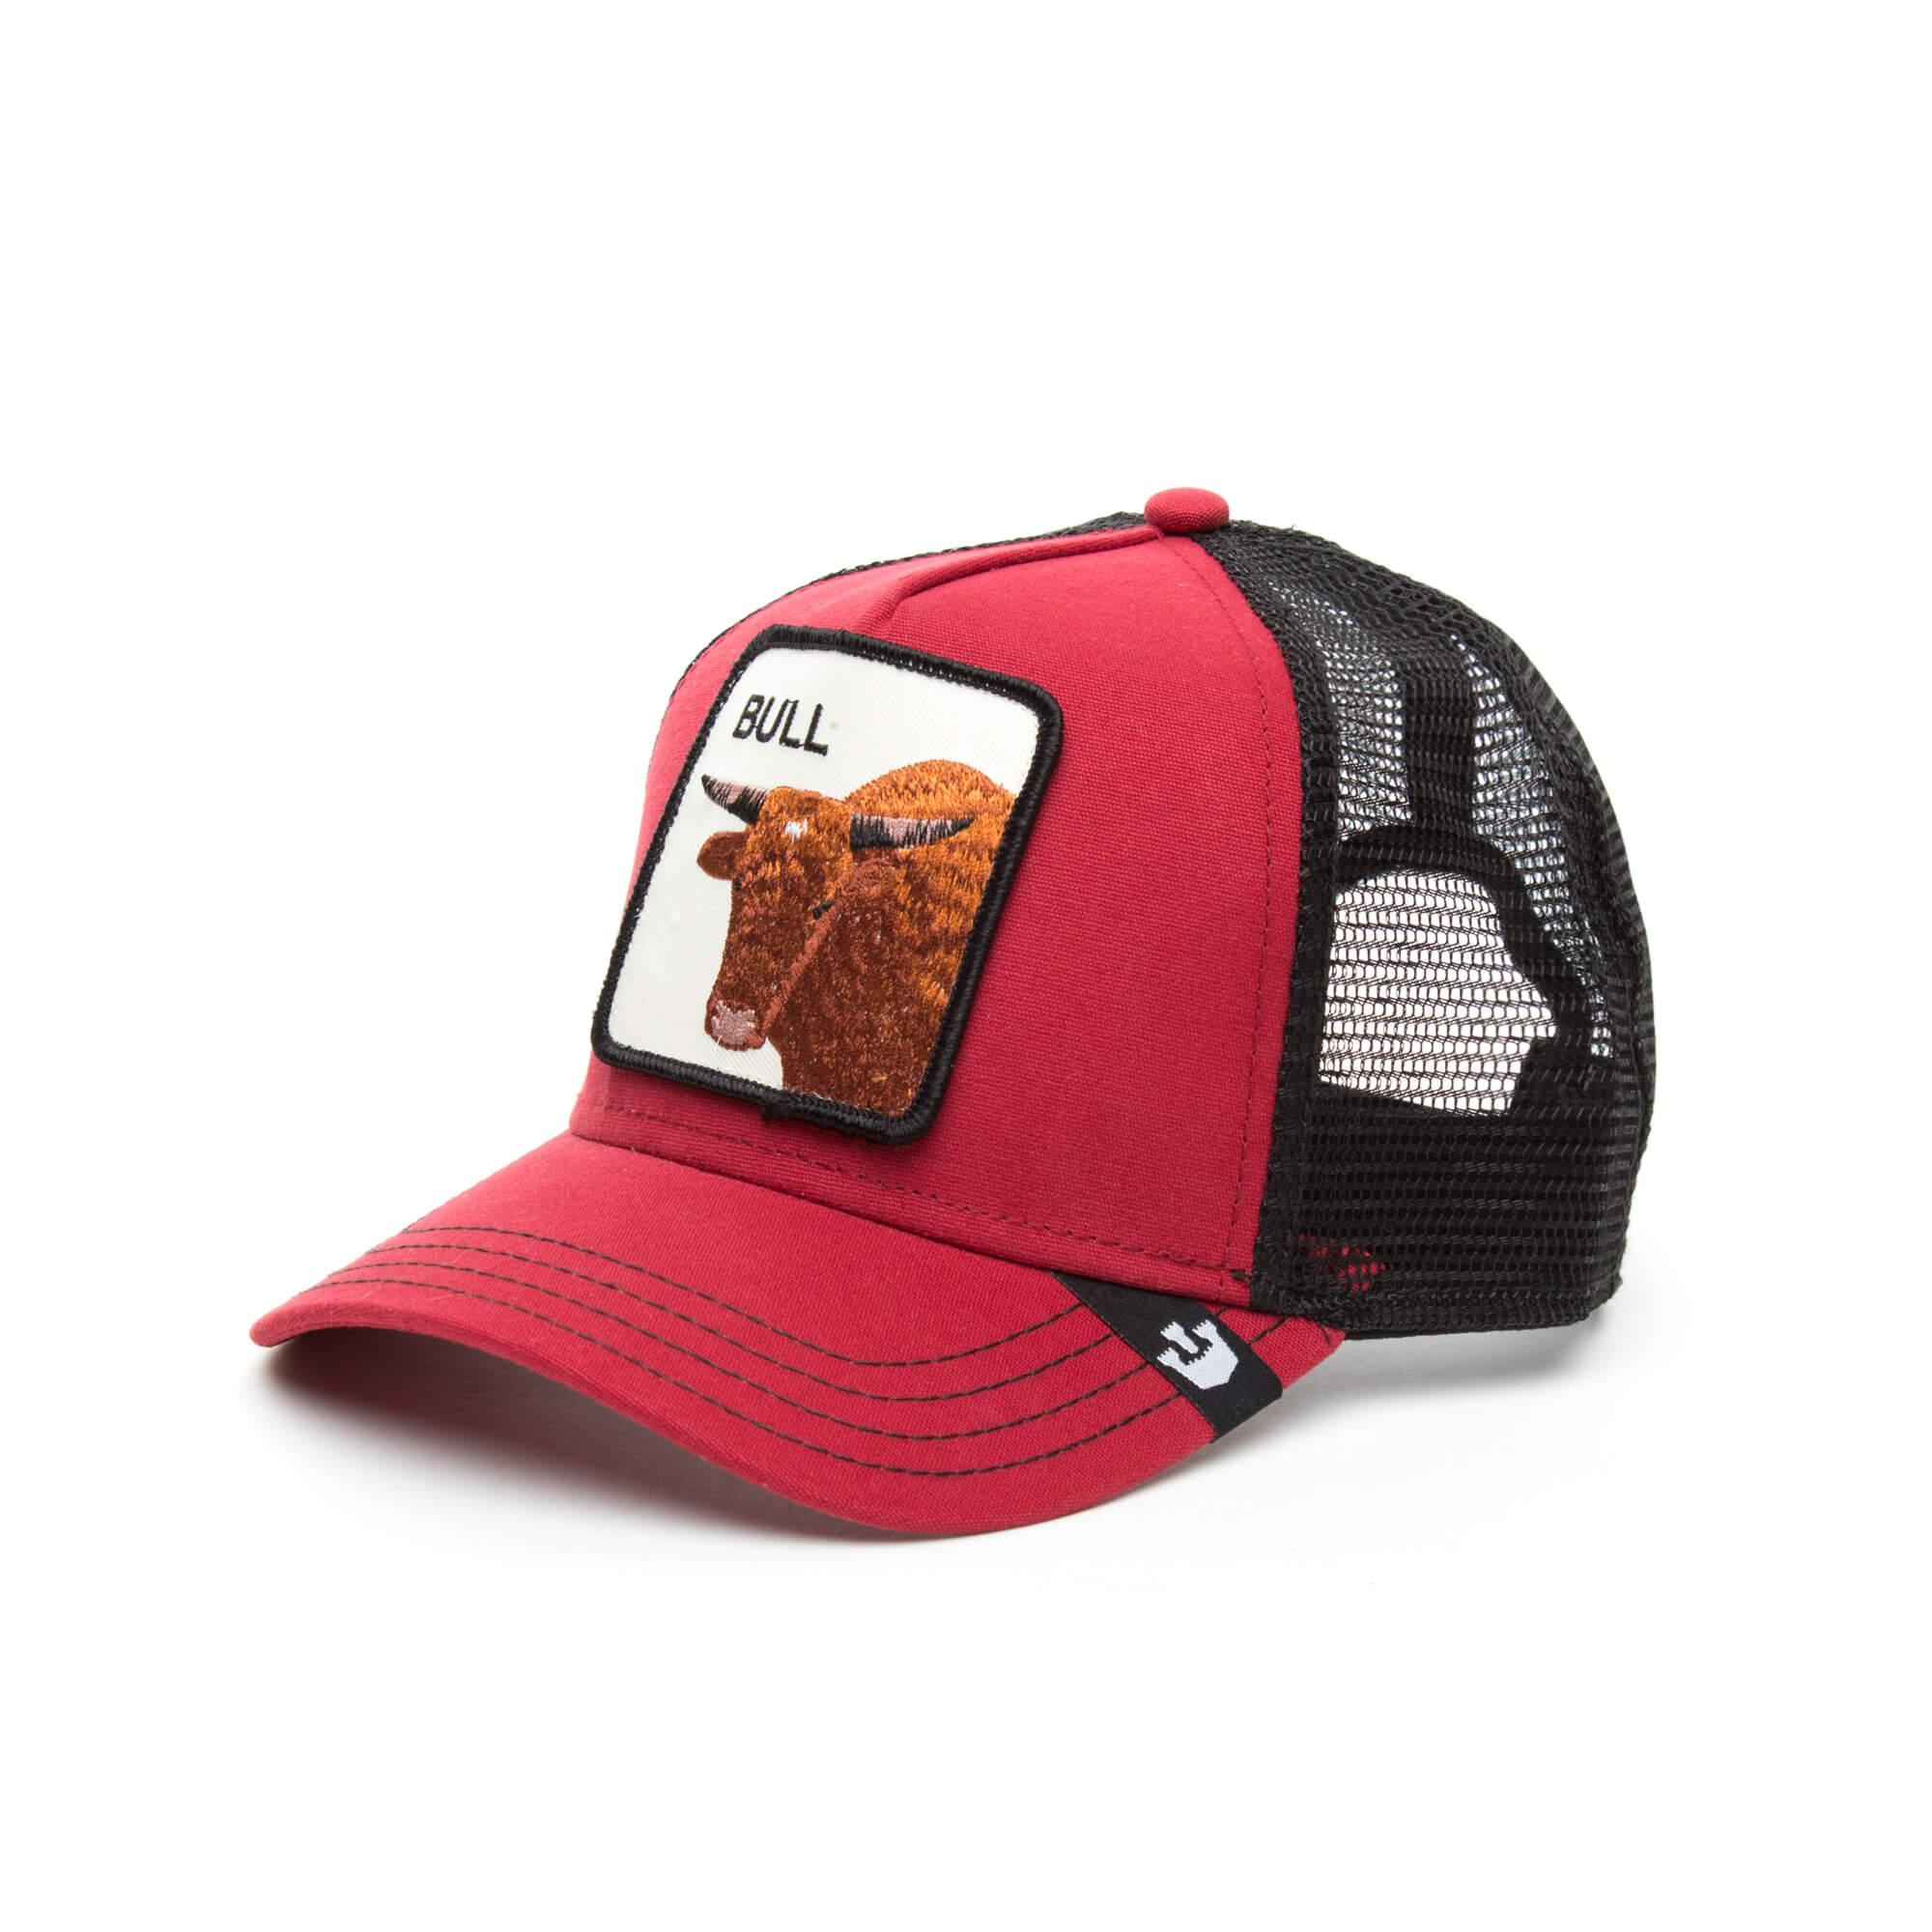 d0d37f3c Goorin Bros Bull Unisex Kırmızı Şapka Kadin Şapka 3175750 | SuperStep